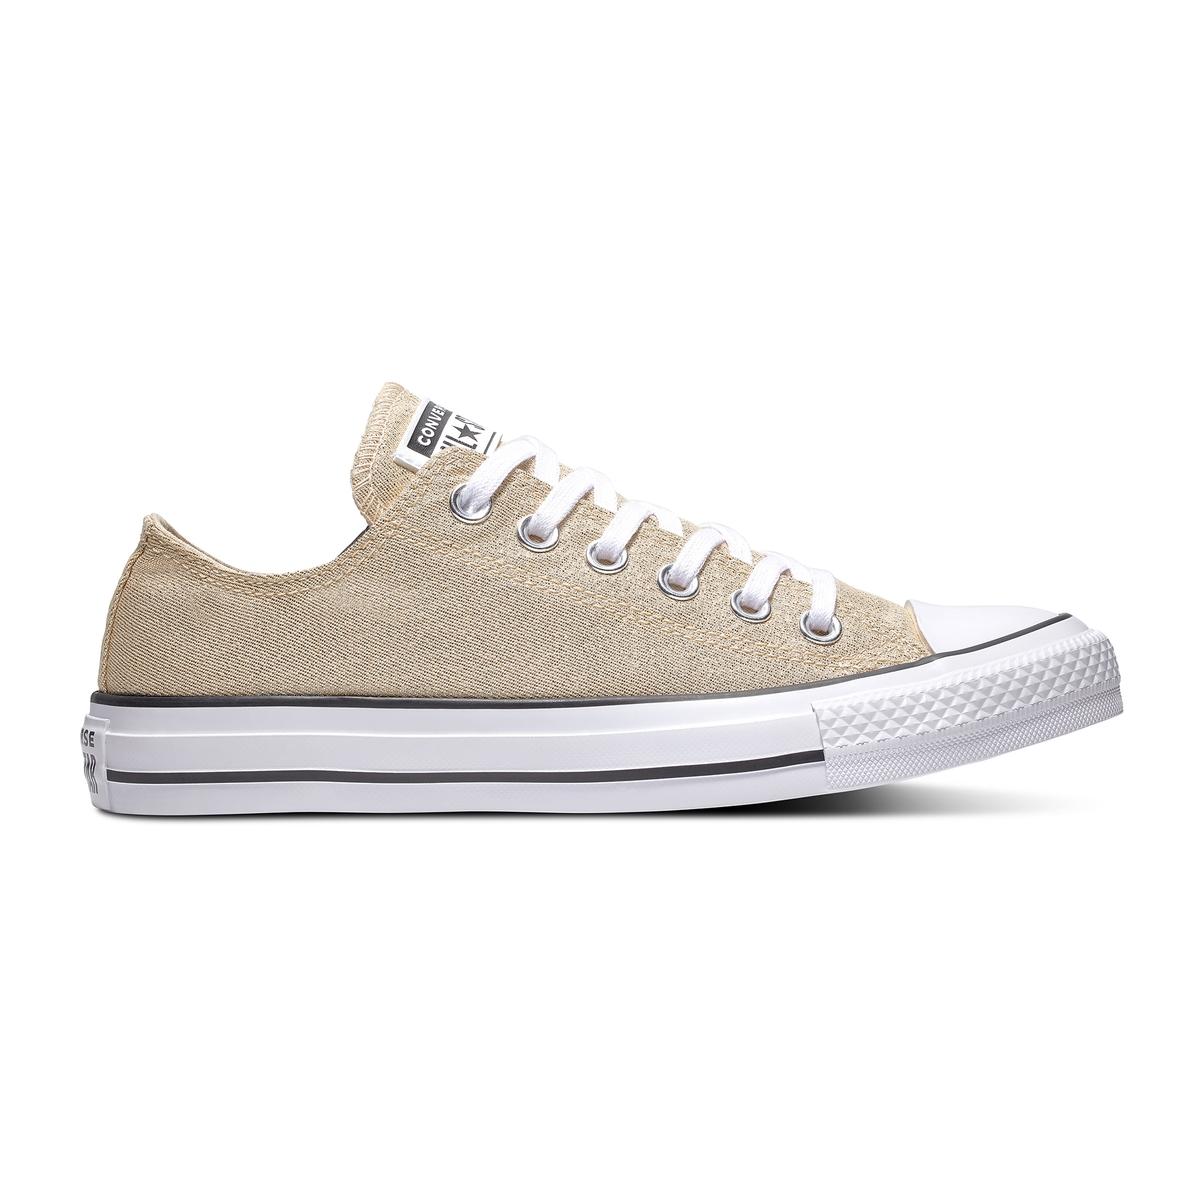 Zapatillas deportivas de caña baja Chuck Taylor All Star